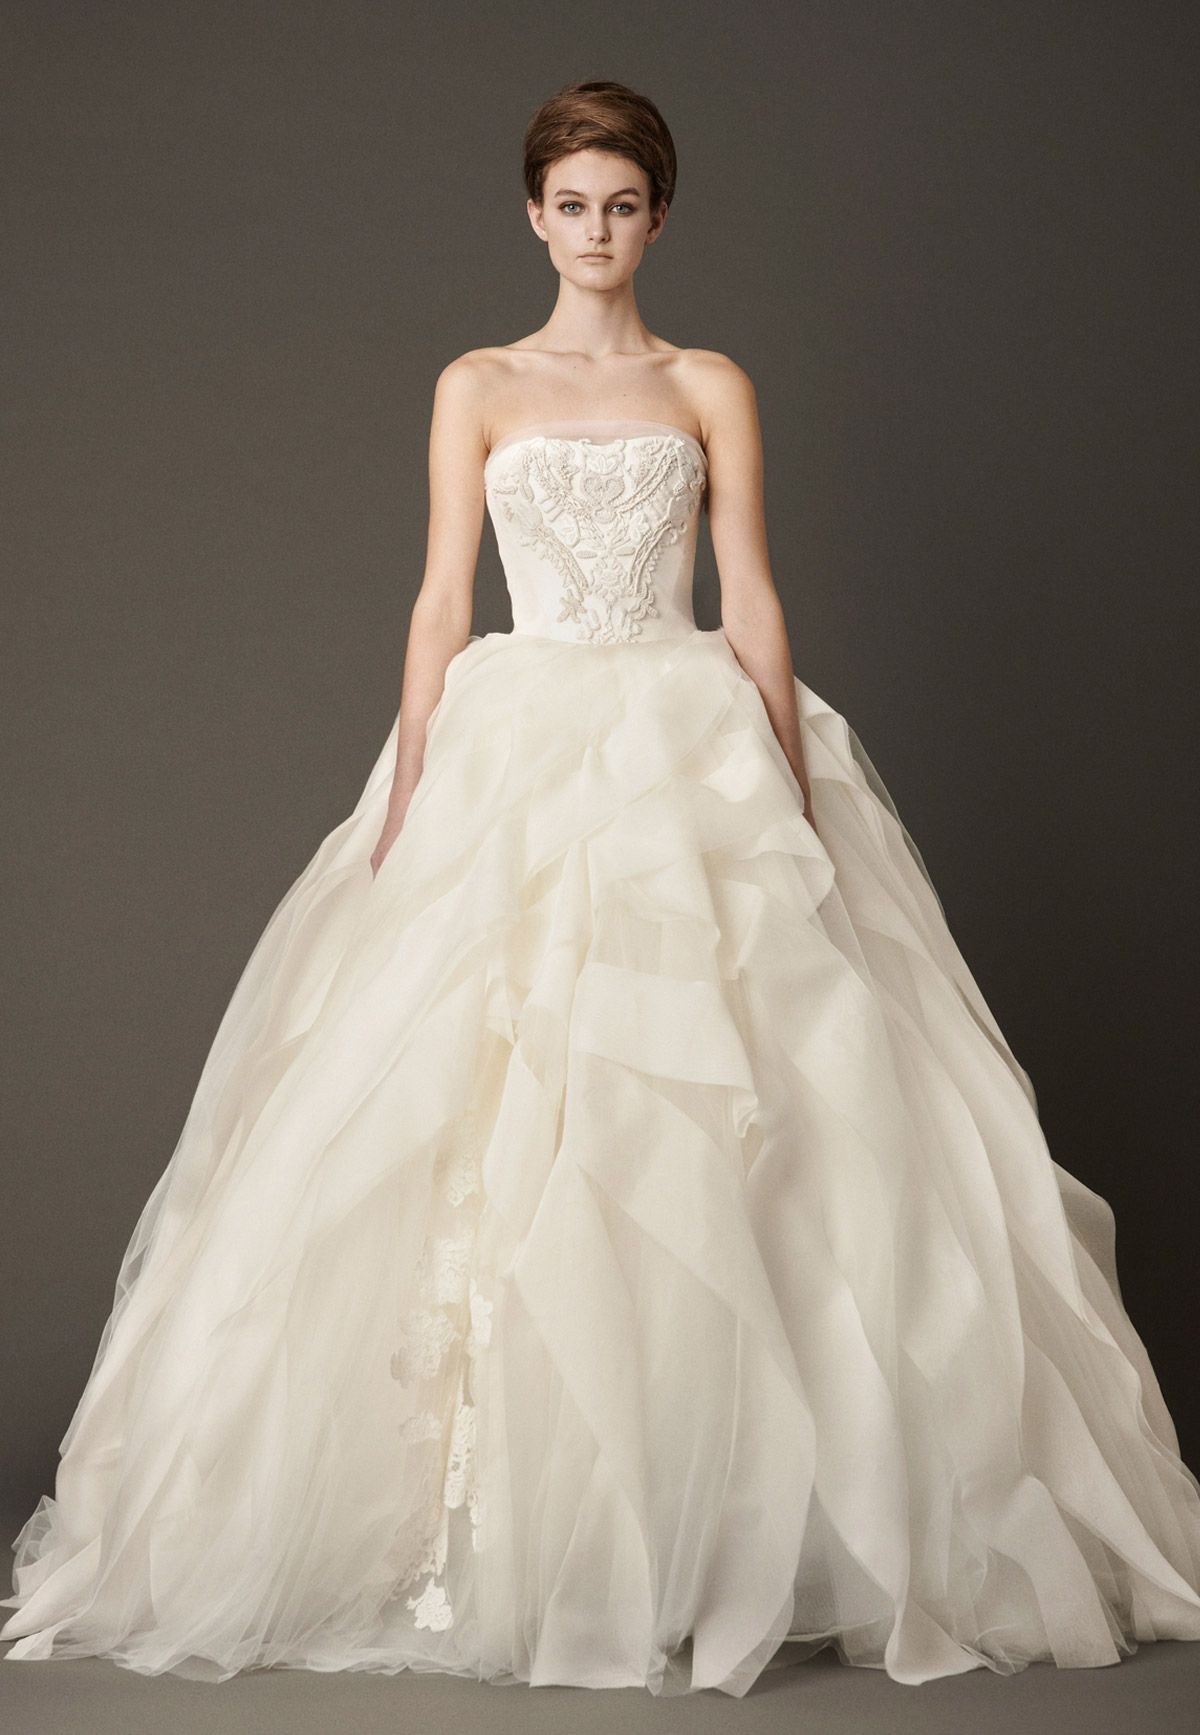 Vera wang liesel size 2 wedding dress bridal gowns wedding vera wang liesel size 2 wedding dress junglespirit Gallery